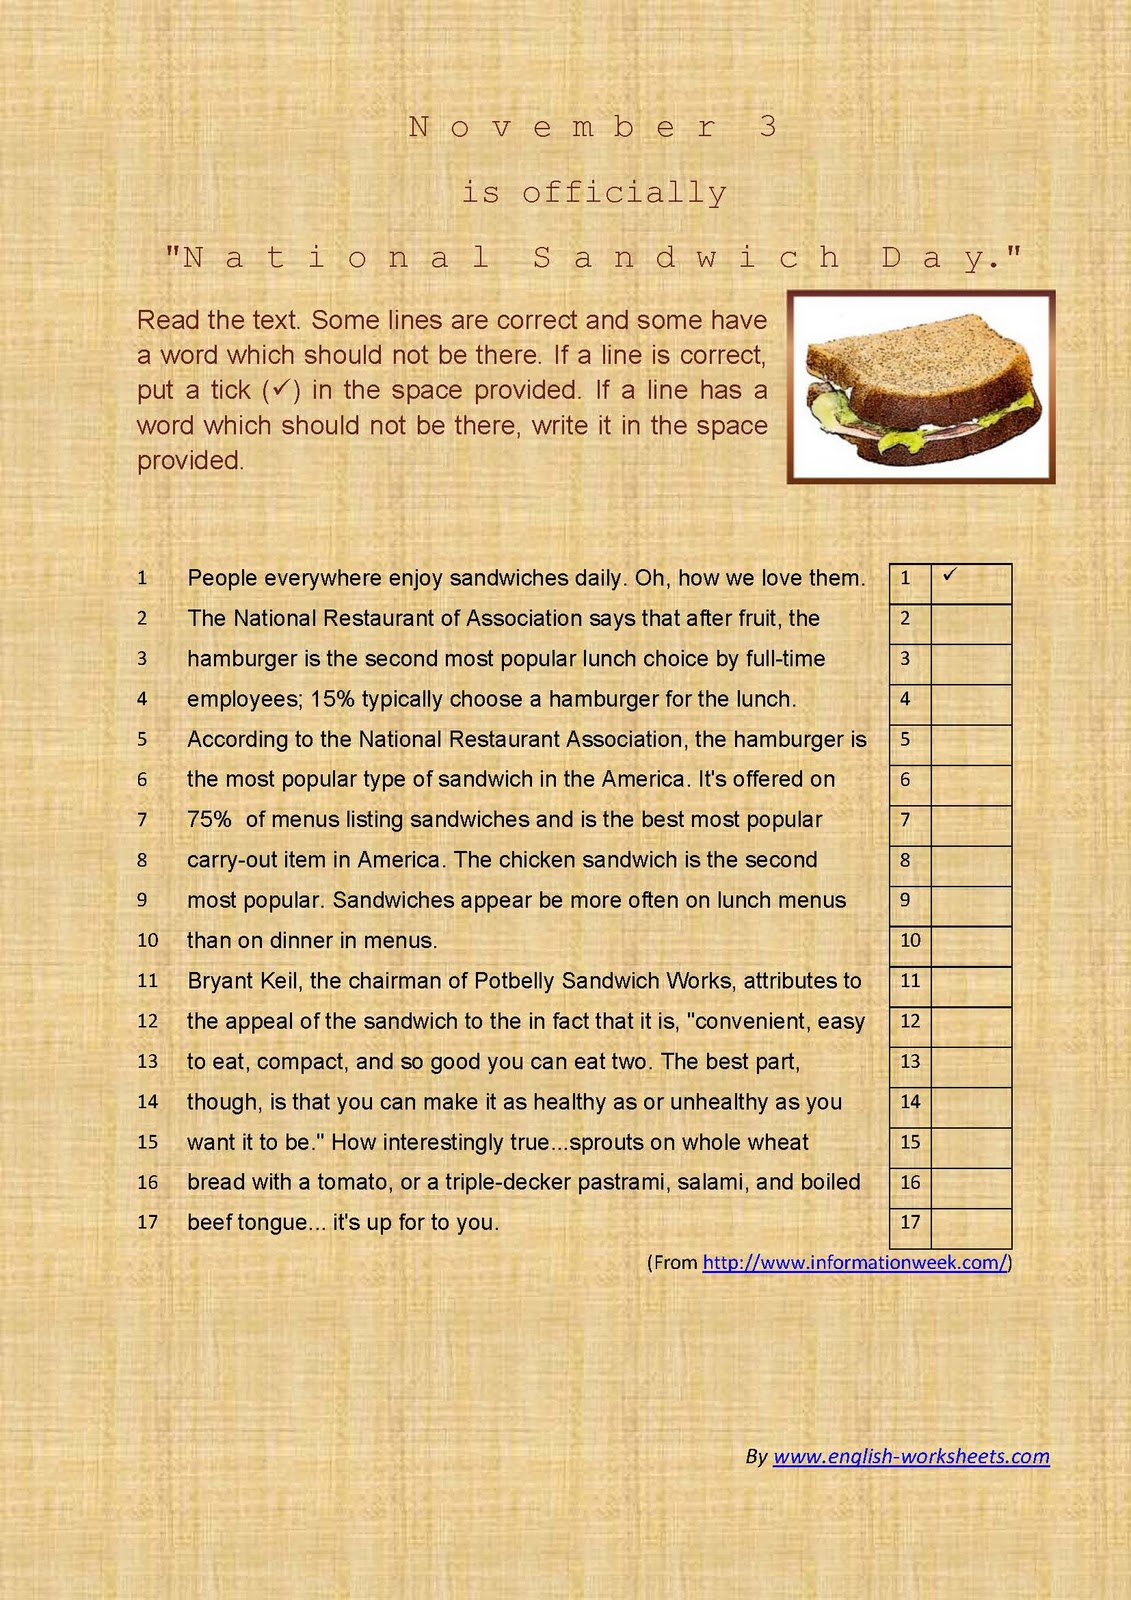 http://1.bp.blogspot.com/_VSfIQ-i5VzM/TMVC-Gw6JBI/AAAAAAAAAGg/LDpMQ0LeVxE/s1600/3%25252BNov_Sandwich%25252BDay%25252BWorksheet.jpg